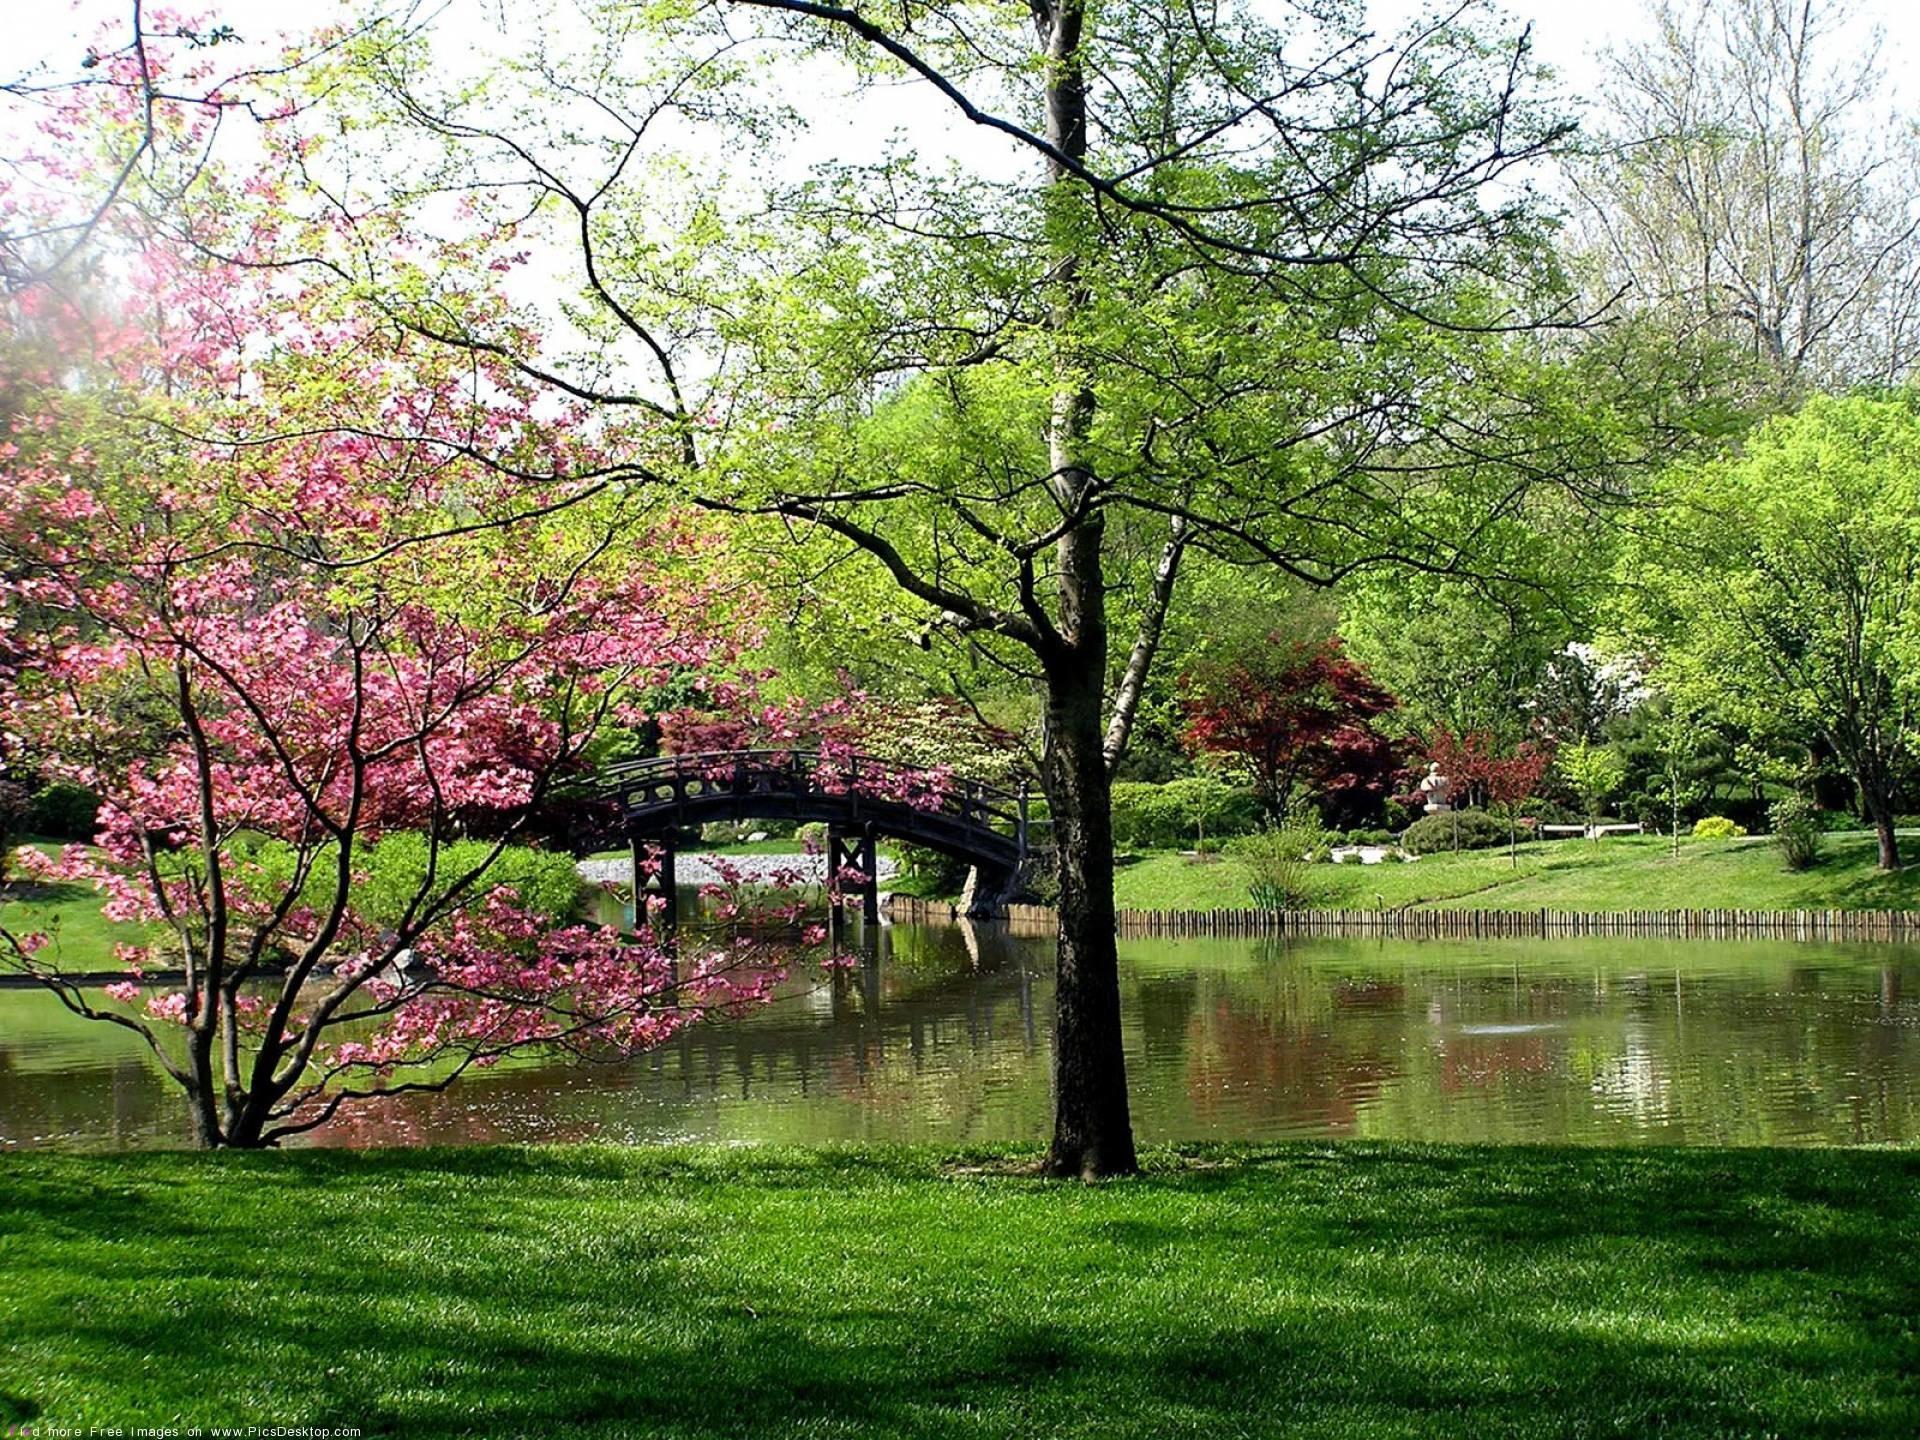 Nature Springtime Free Desktop Wallpapers for PC & Mac #11